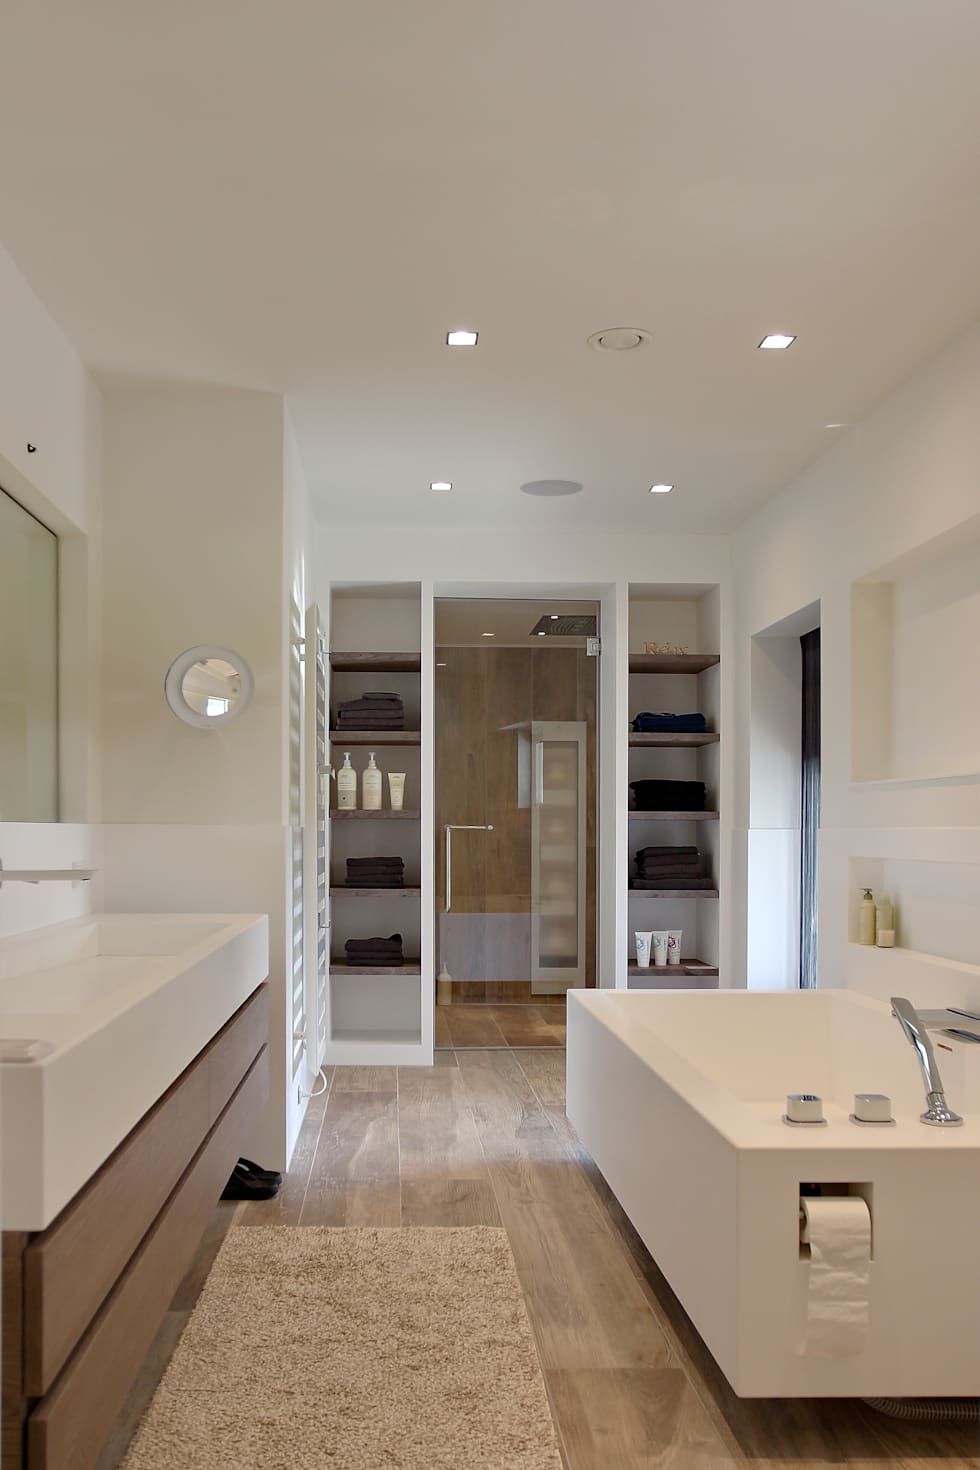 Badkamer: moderne Badkamer door Leonardus interieurarchitect